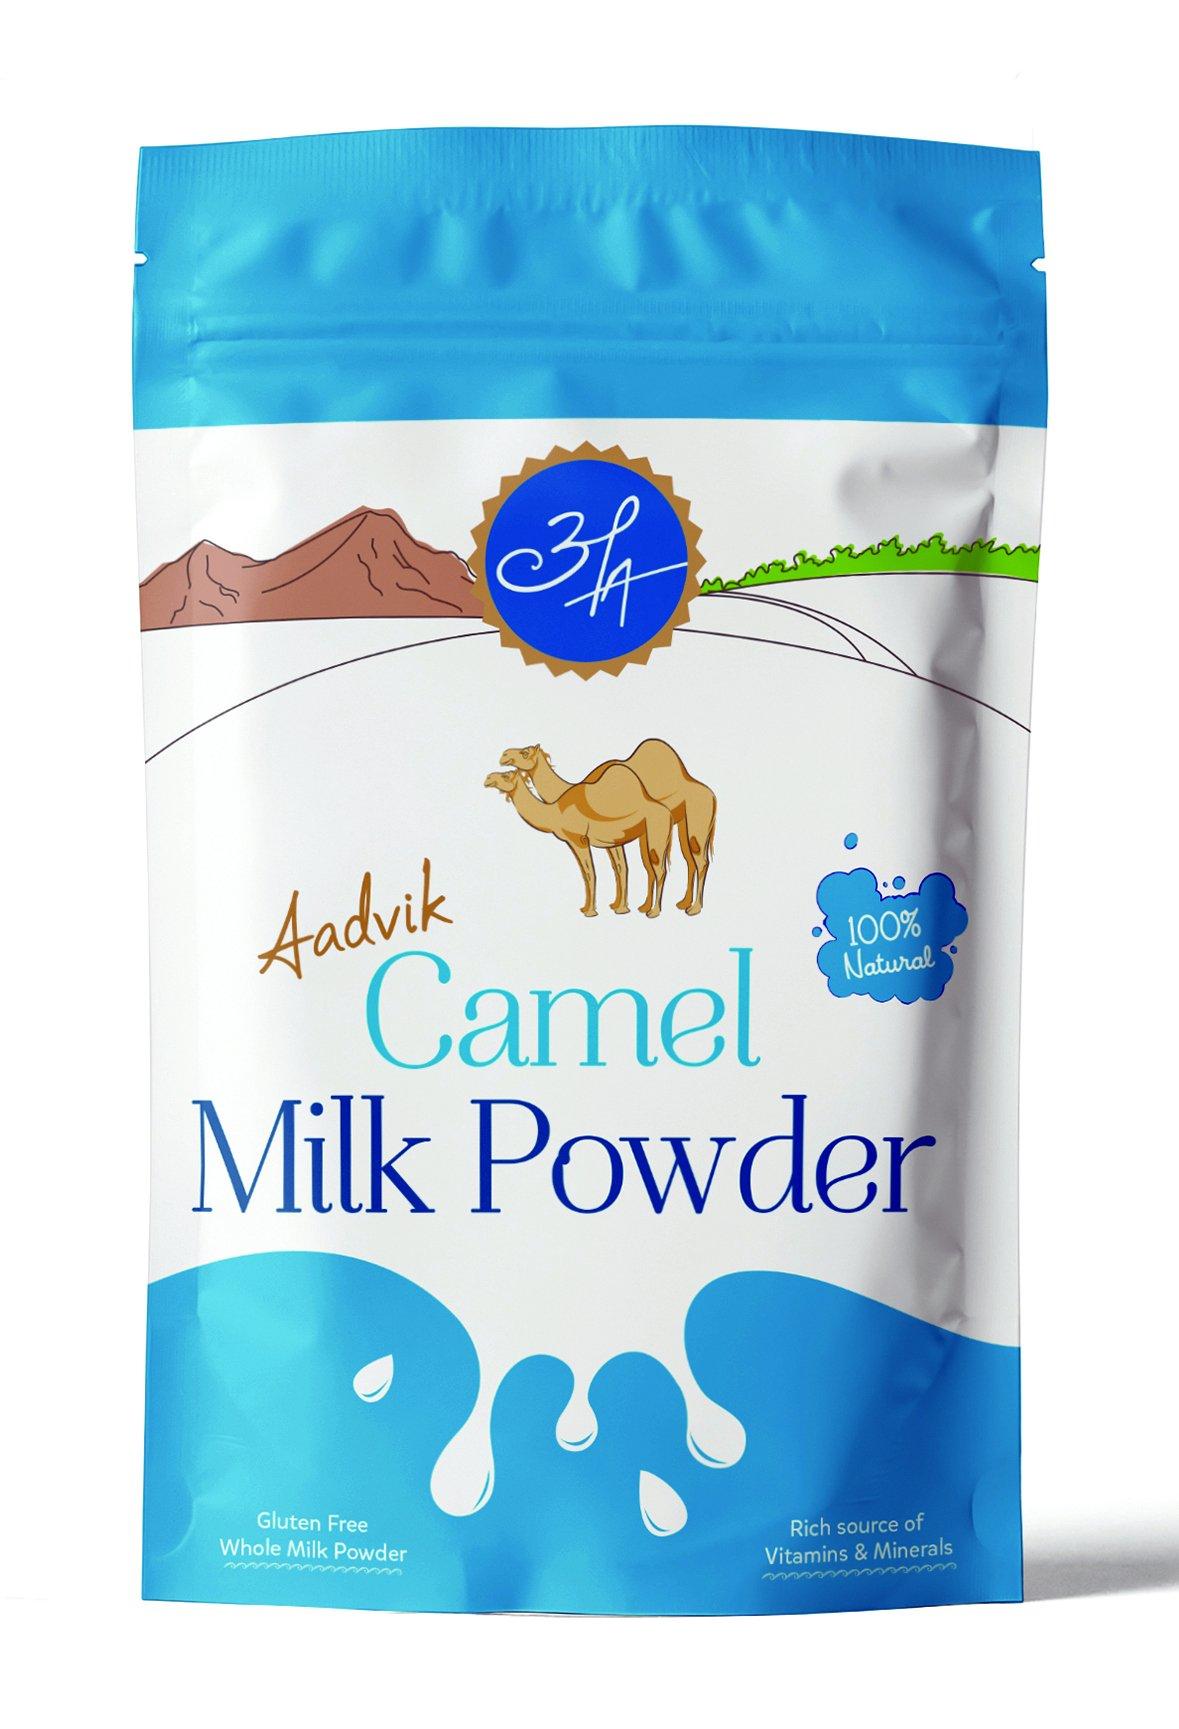 Aadvik Camel Milk Powder 7 Oz (Freeze Dried, Gluten Free, No Additives) 10 servings, makes 70 fl oz